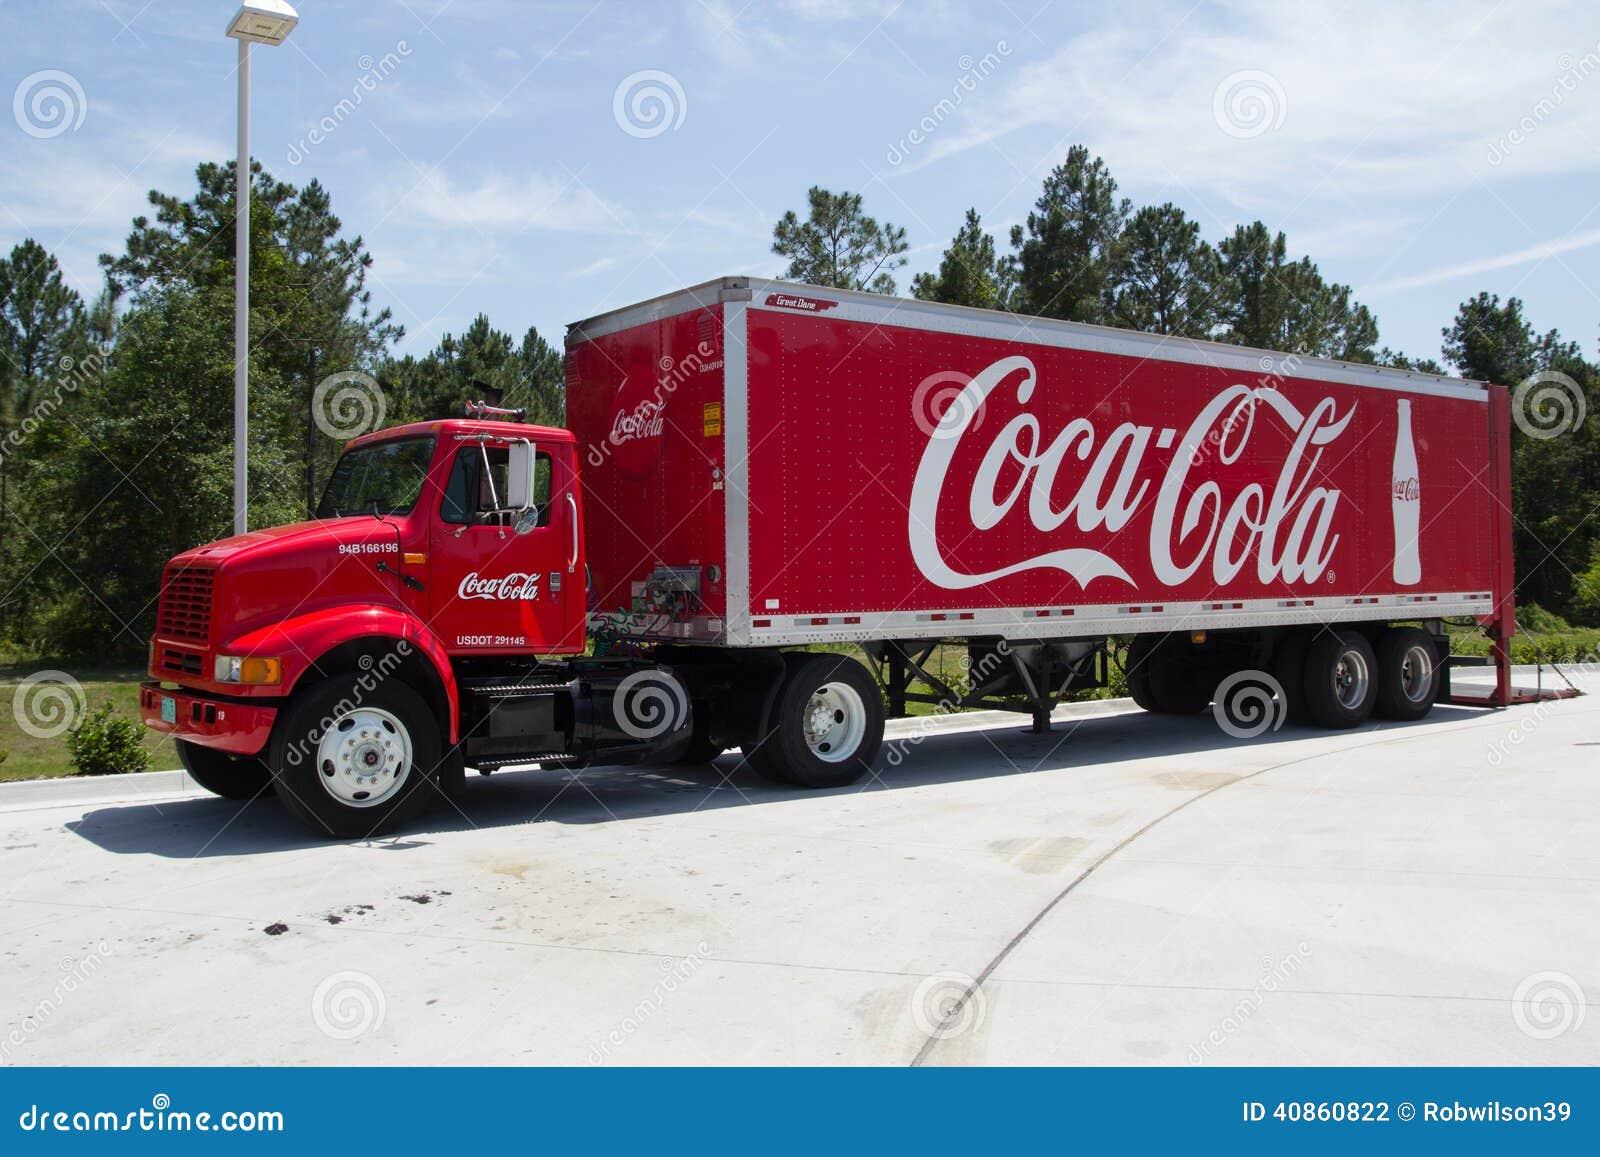 coca cola truck editorial photography image 40860822. Black Bedroom Furniture Sets. Home Design Ideas